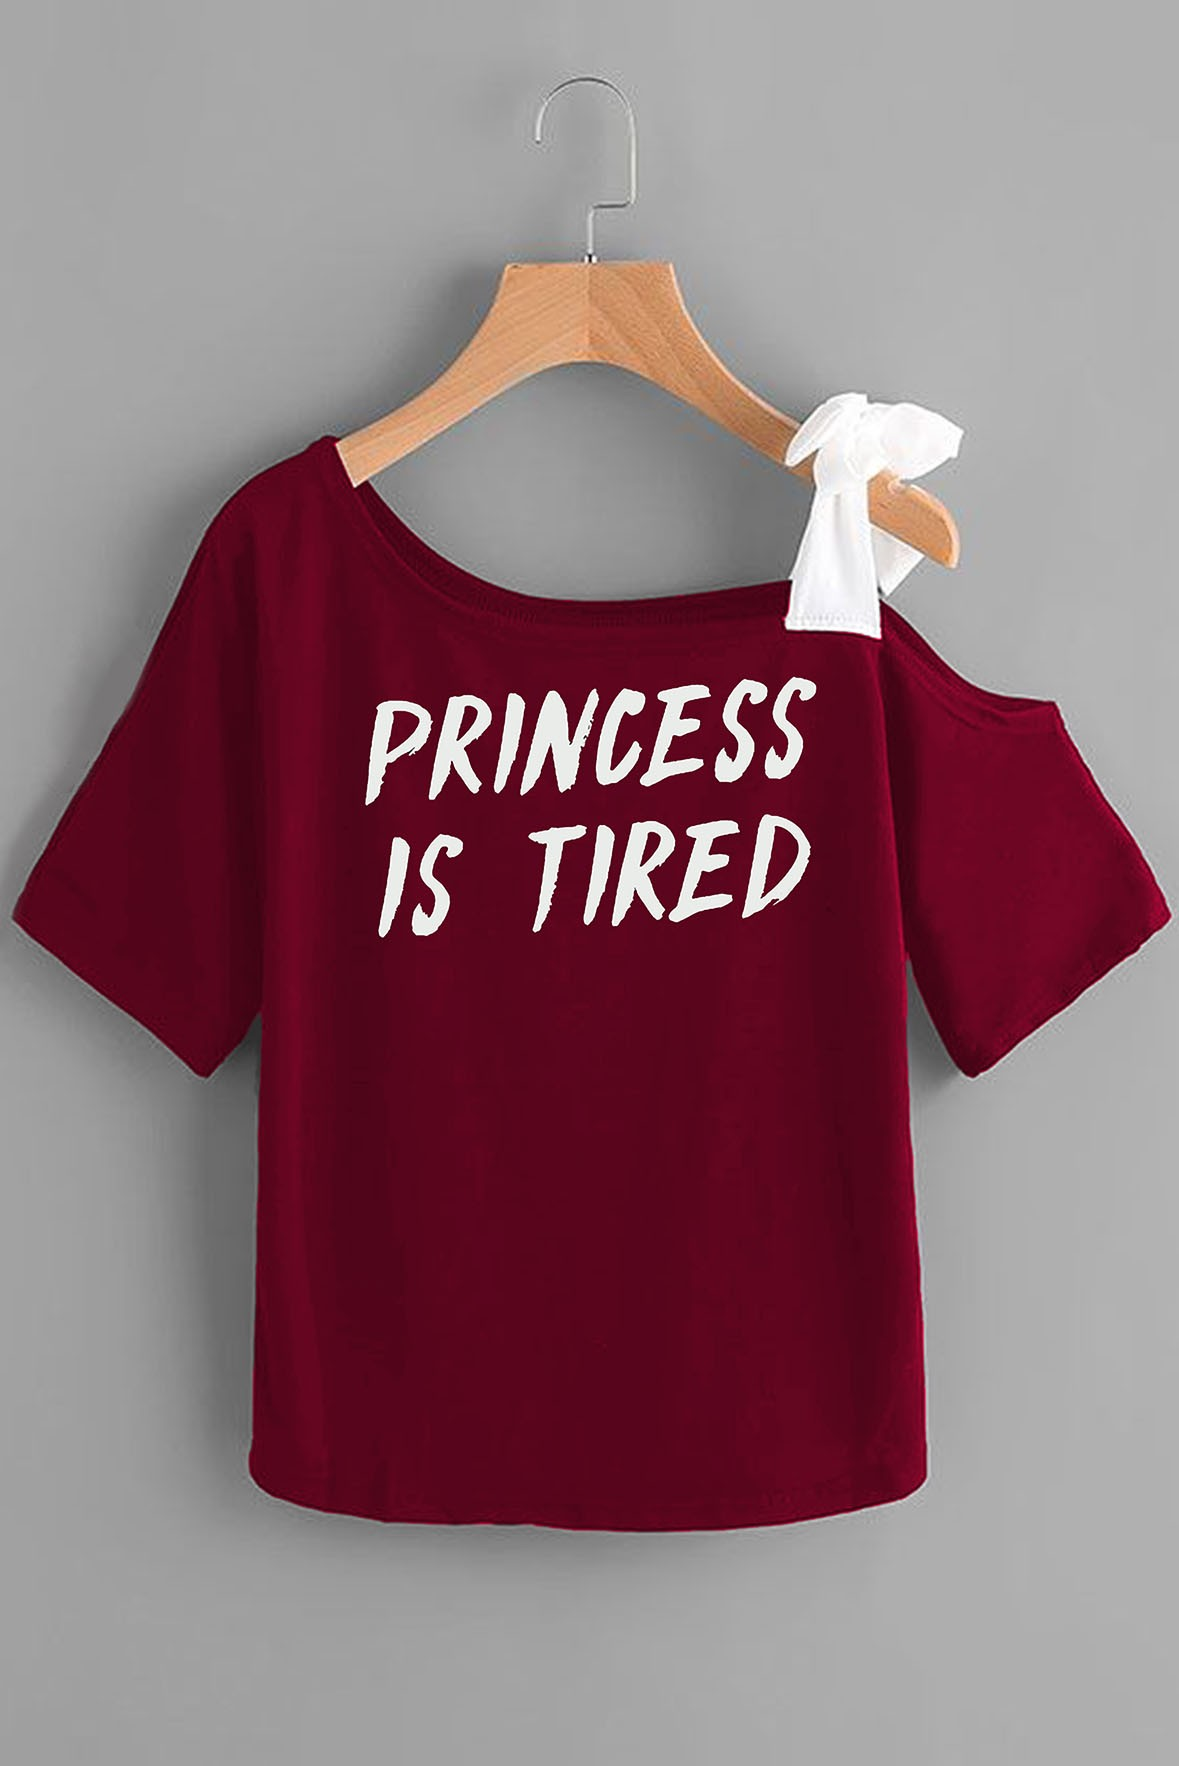 Princess is tired marsala top